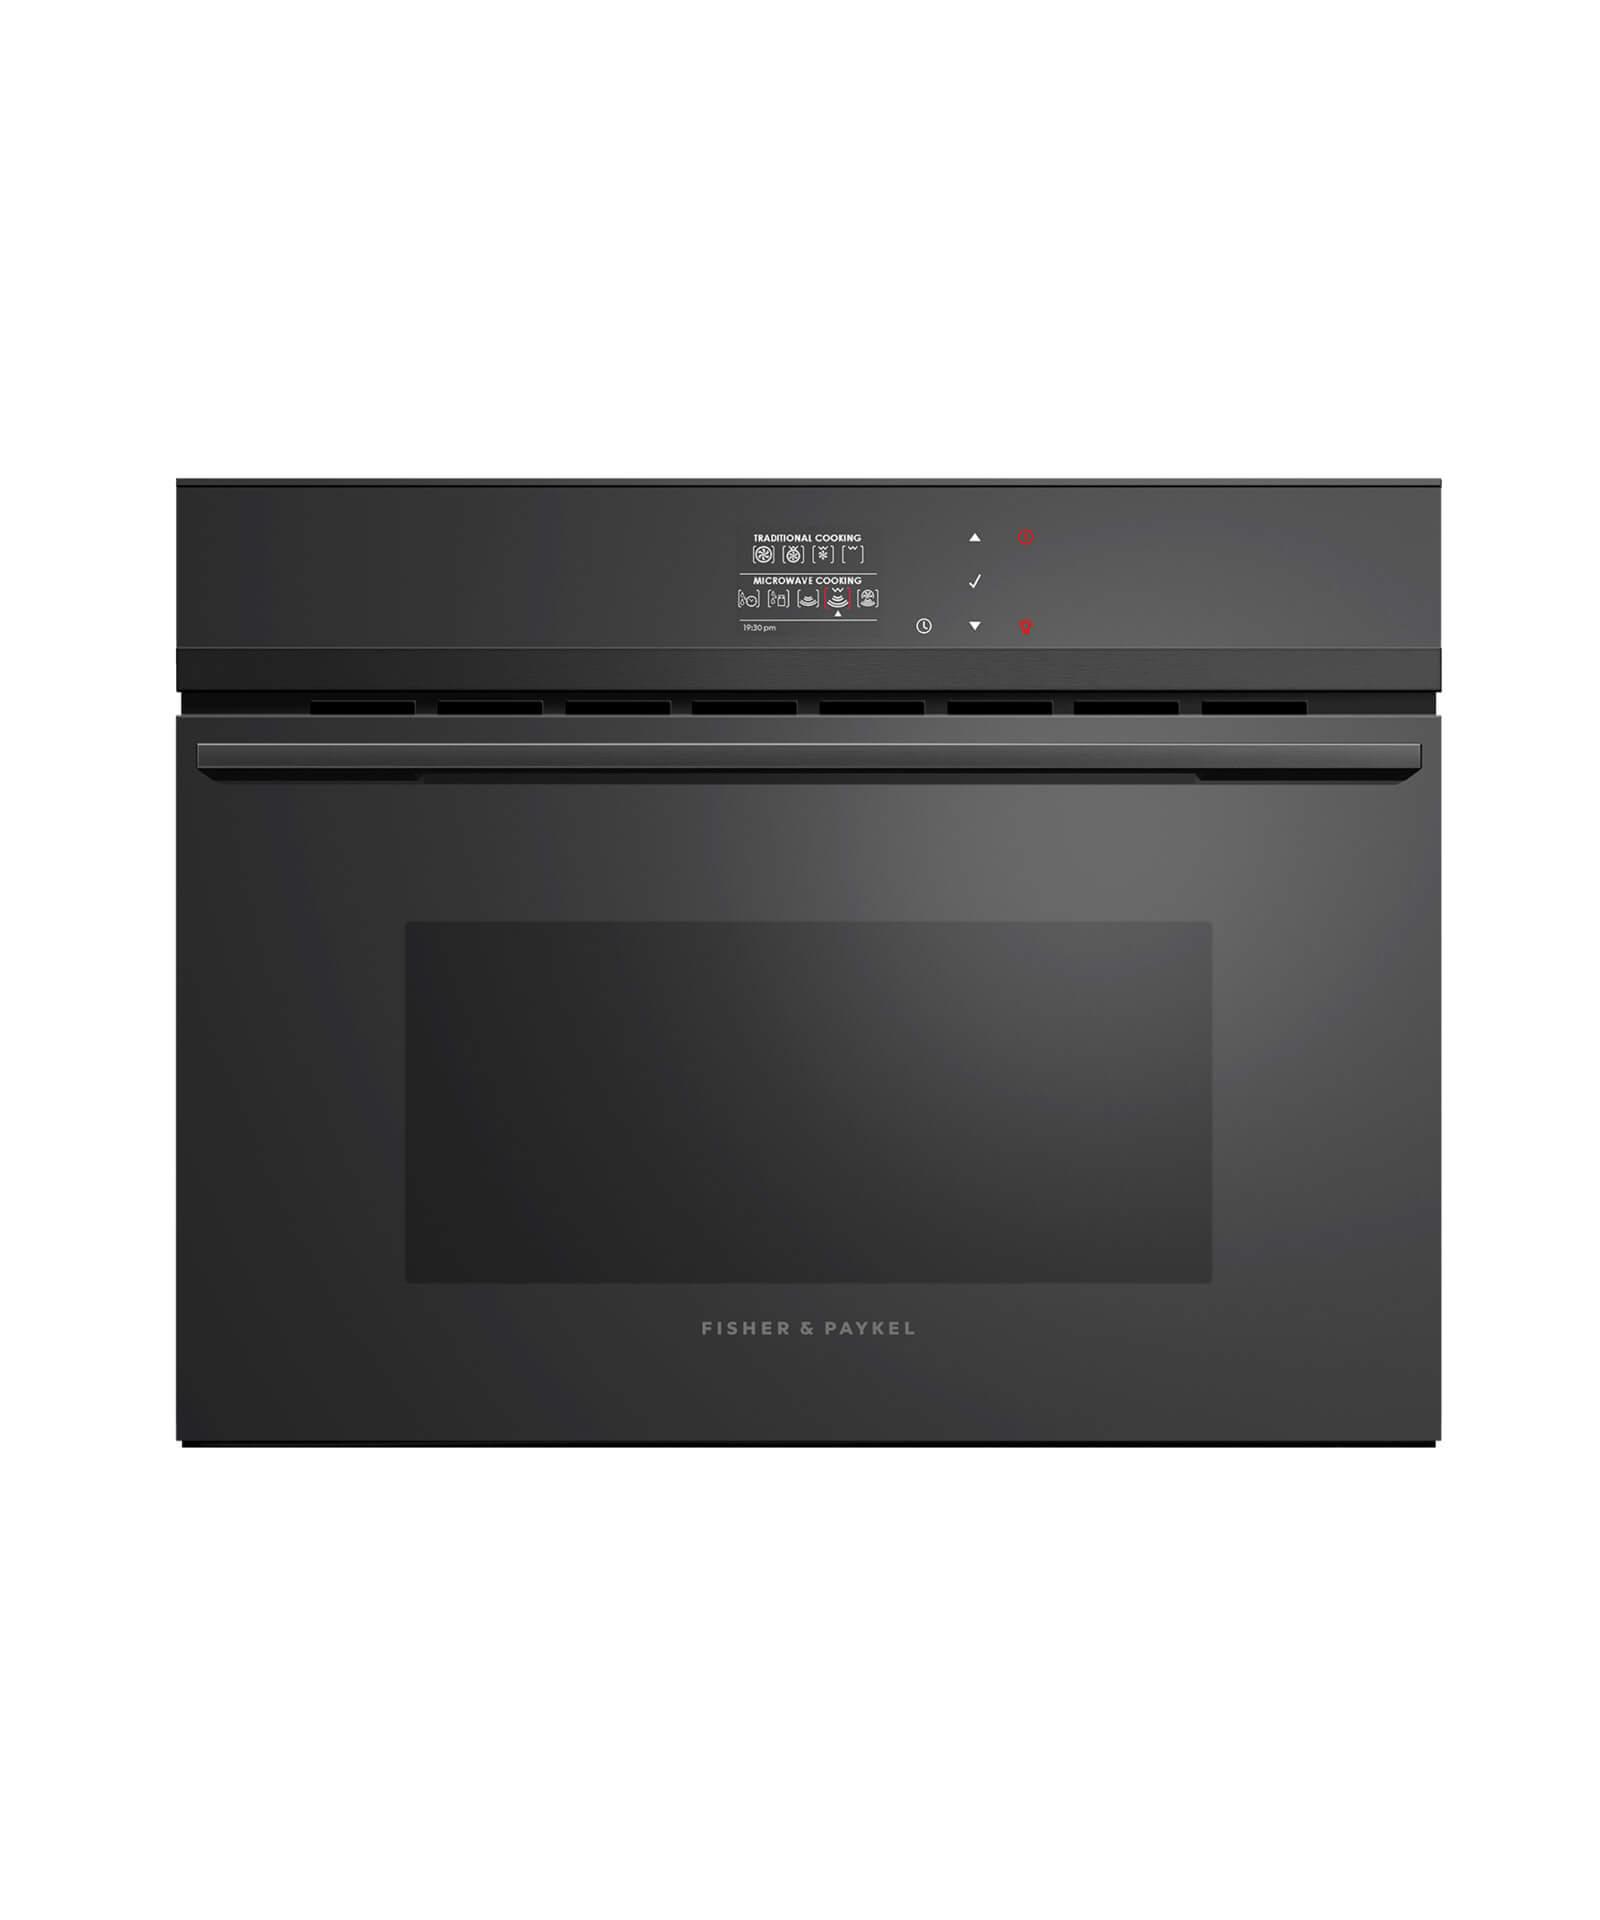 Best Combination Microwave Oven 2012: Built-in Combination Microwave Oven 60cm